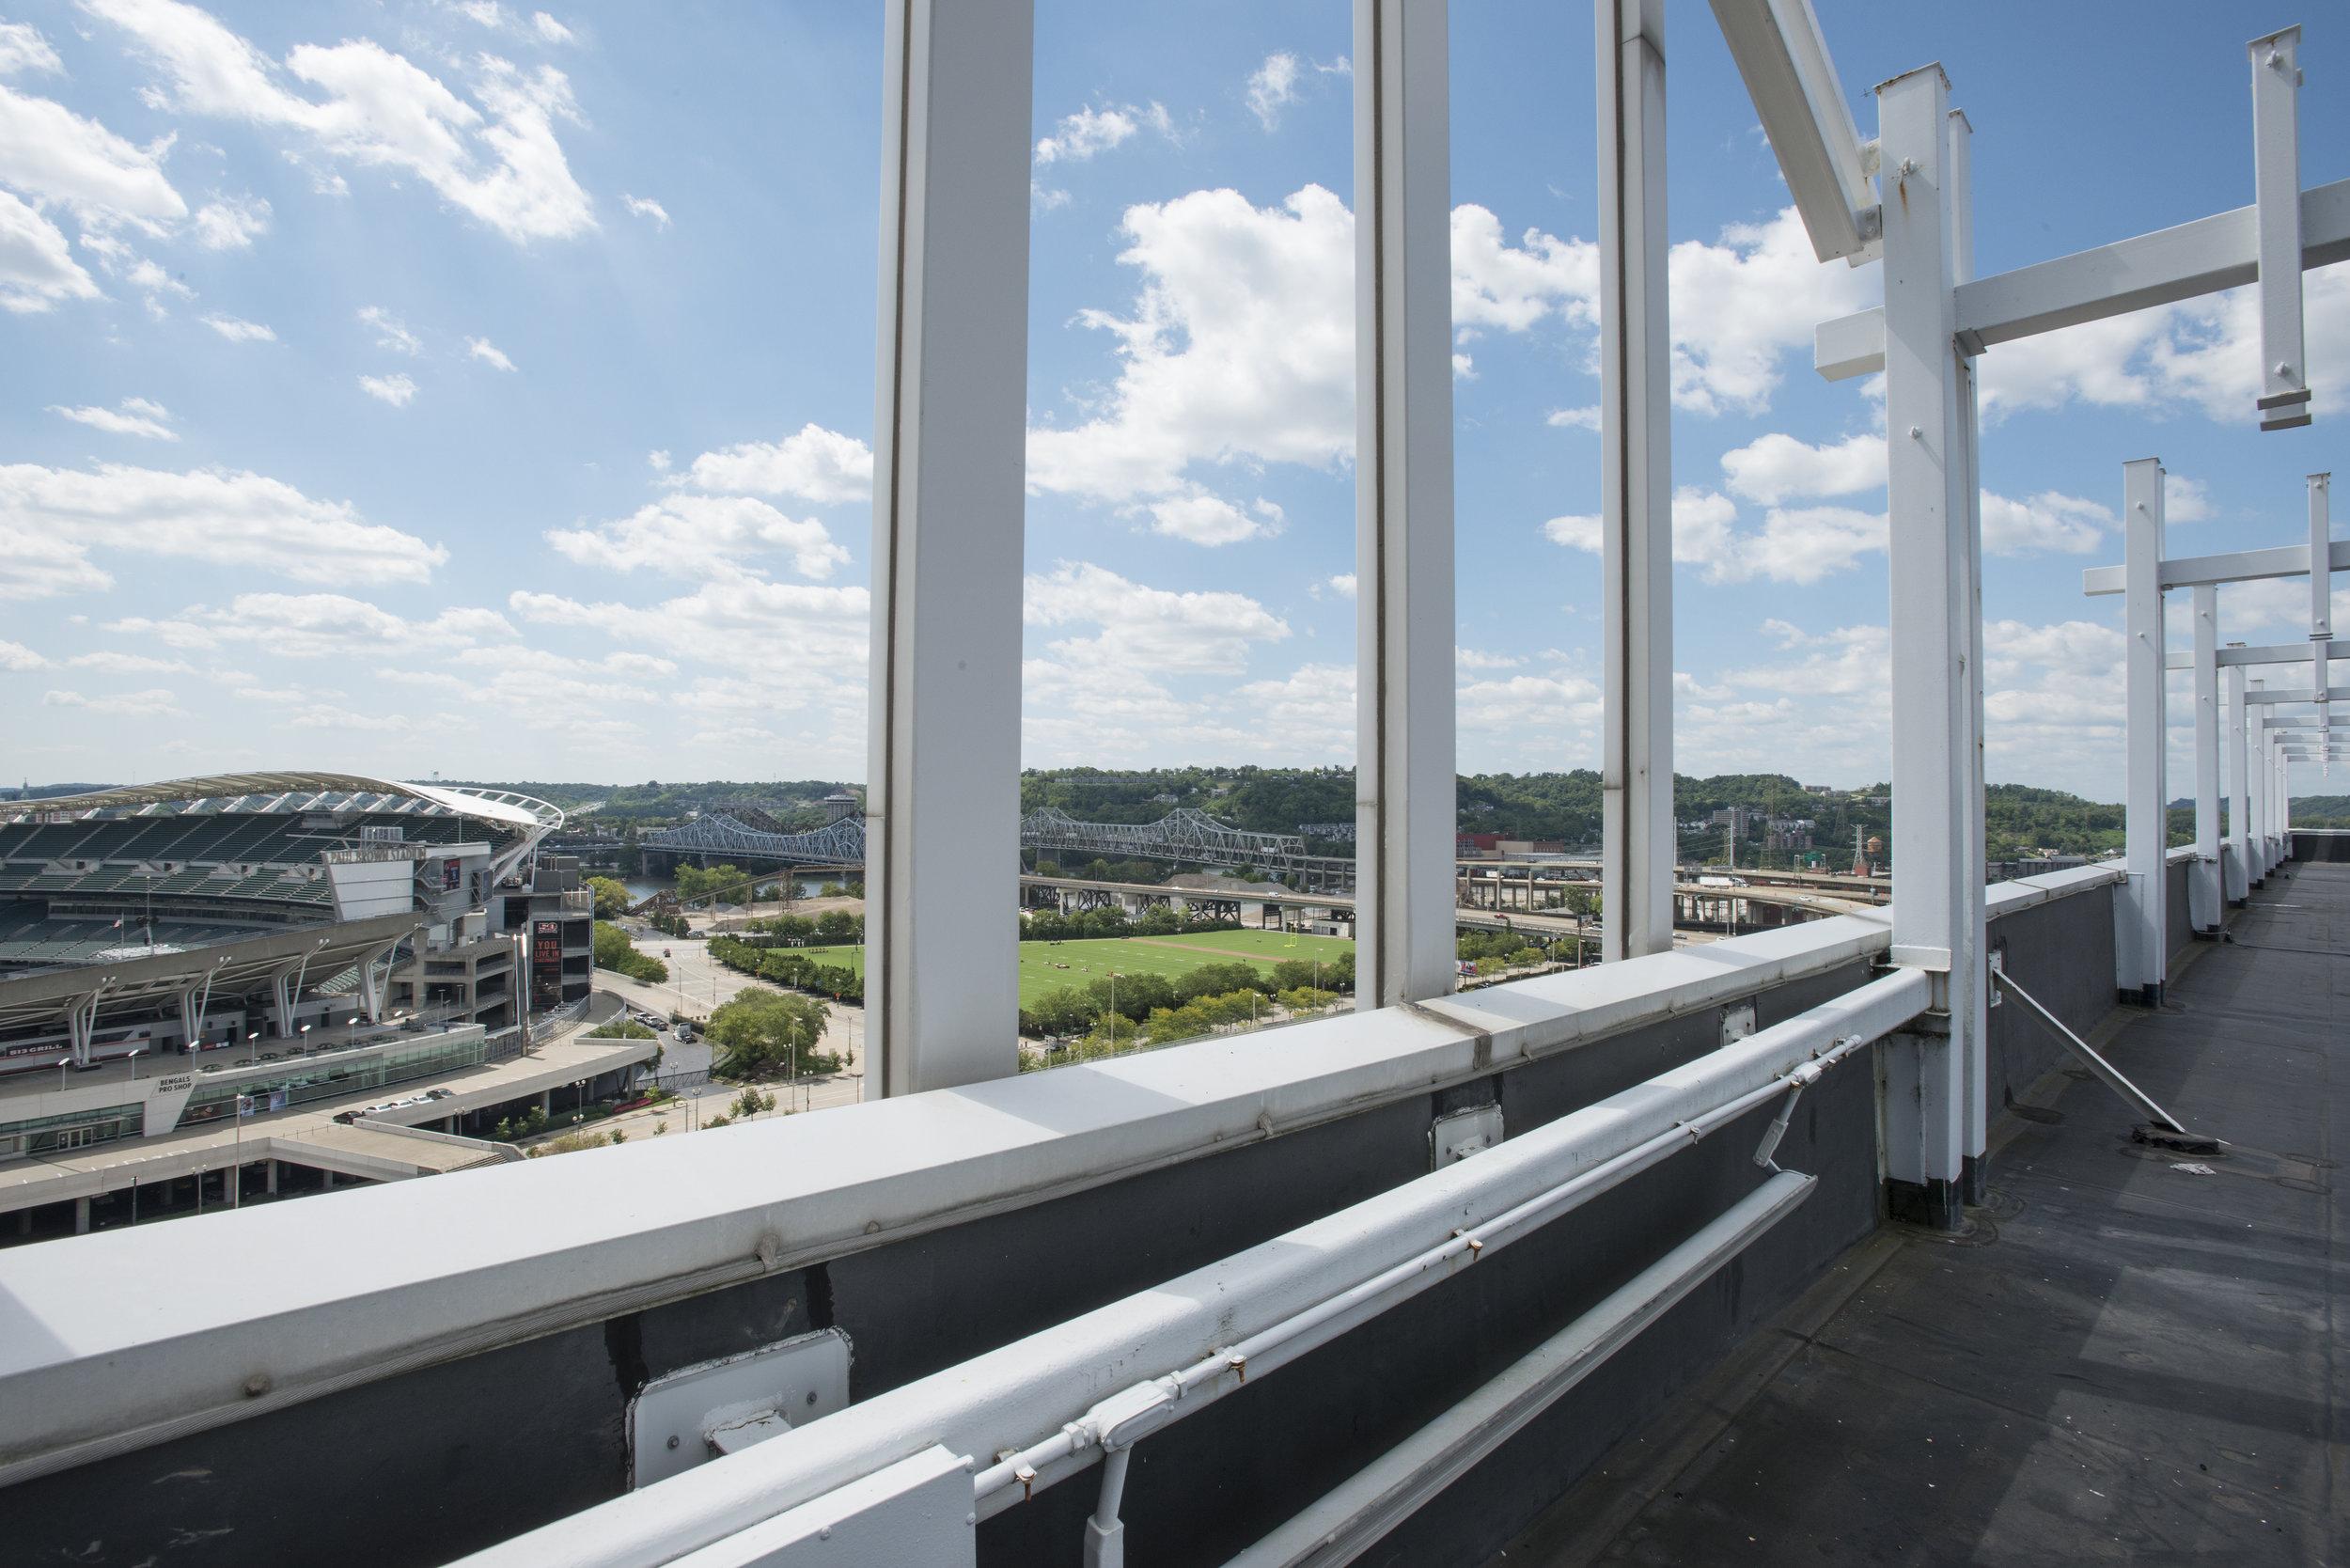 View of Paul Brown Stadium